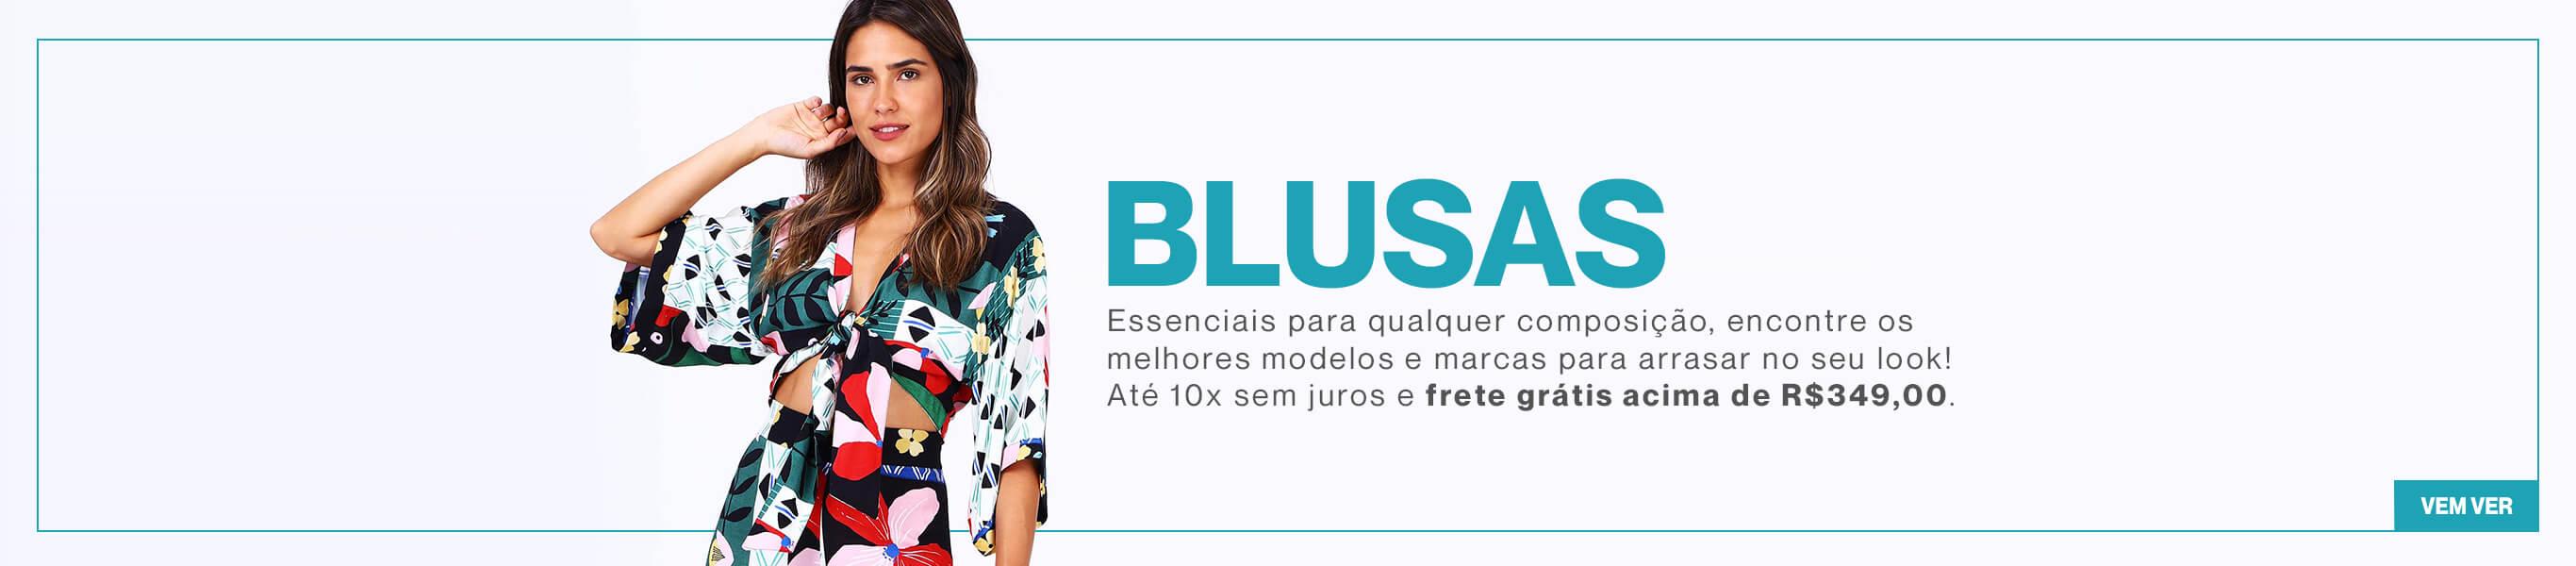 Banner Desktop - Blusas